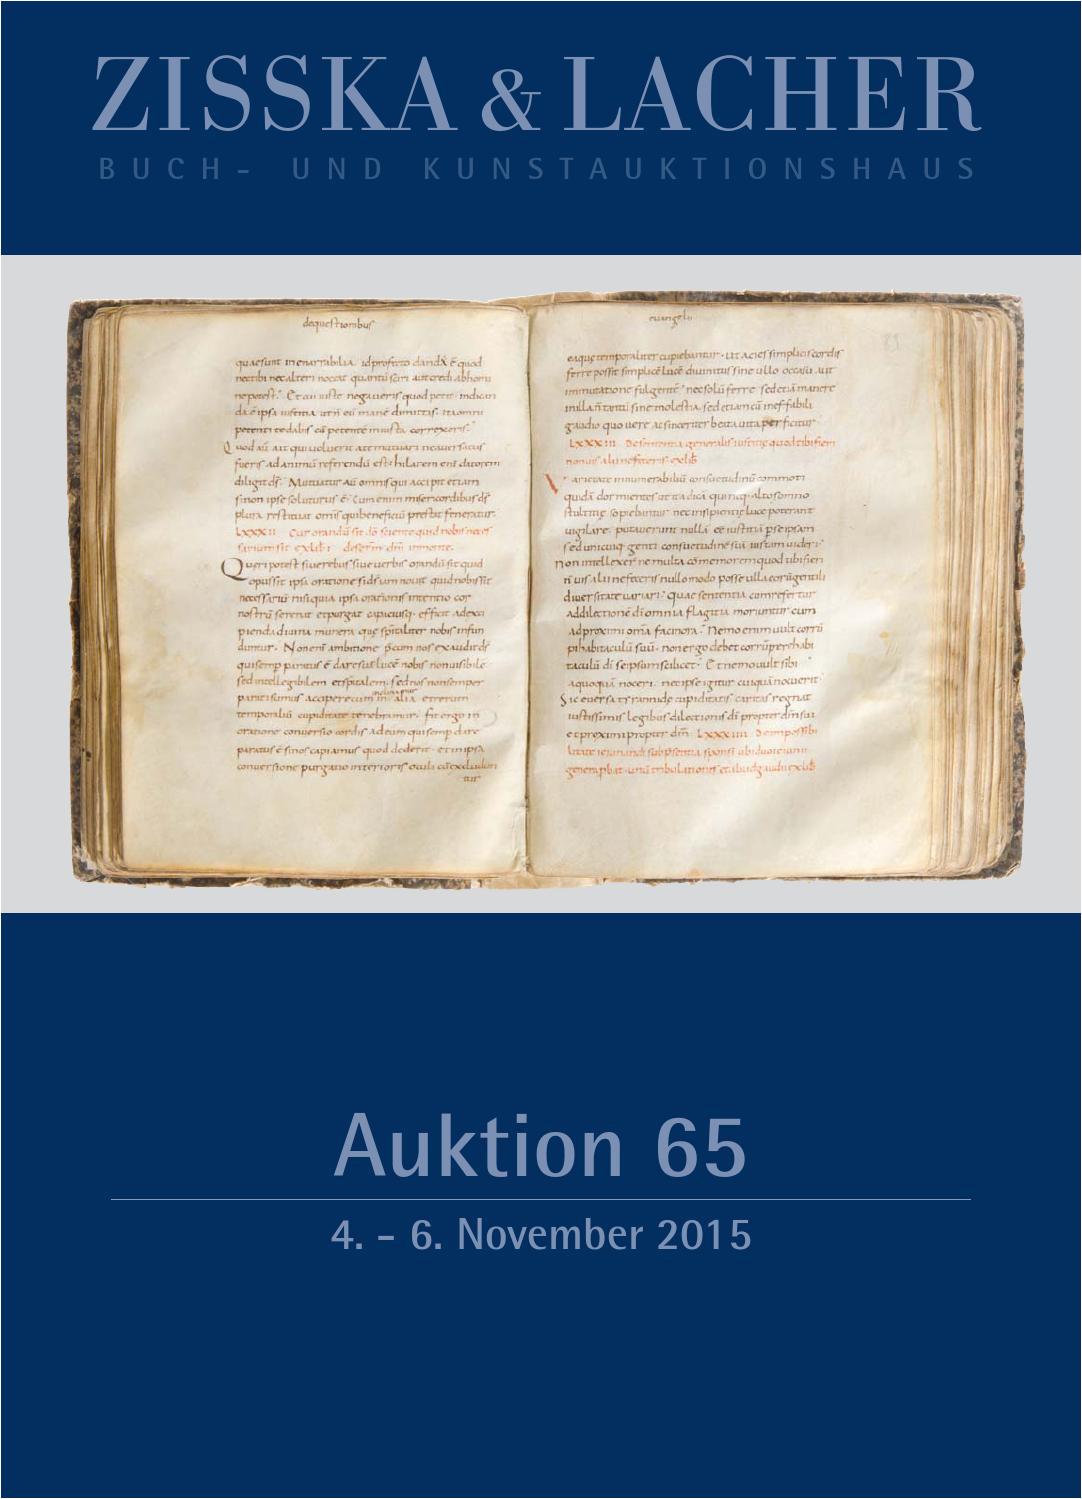 Blank National Id Card Bd Auktion 65 November 2015 Hauptkatalog Teil 1 by